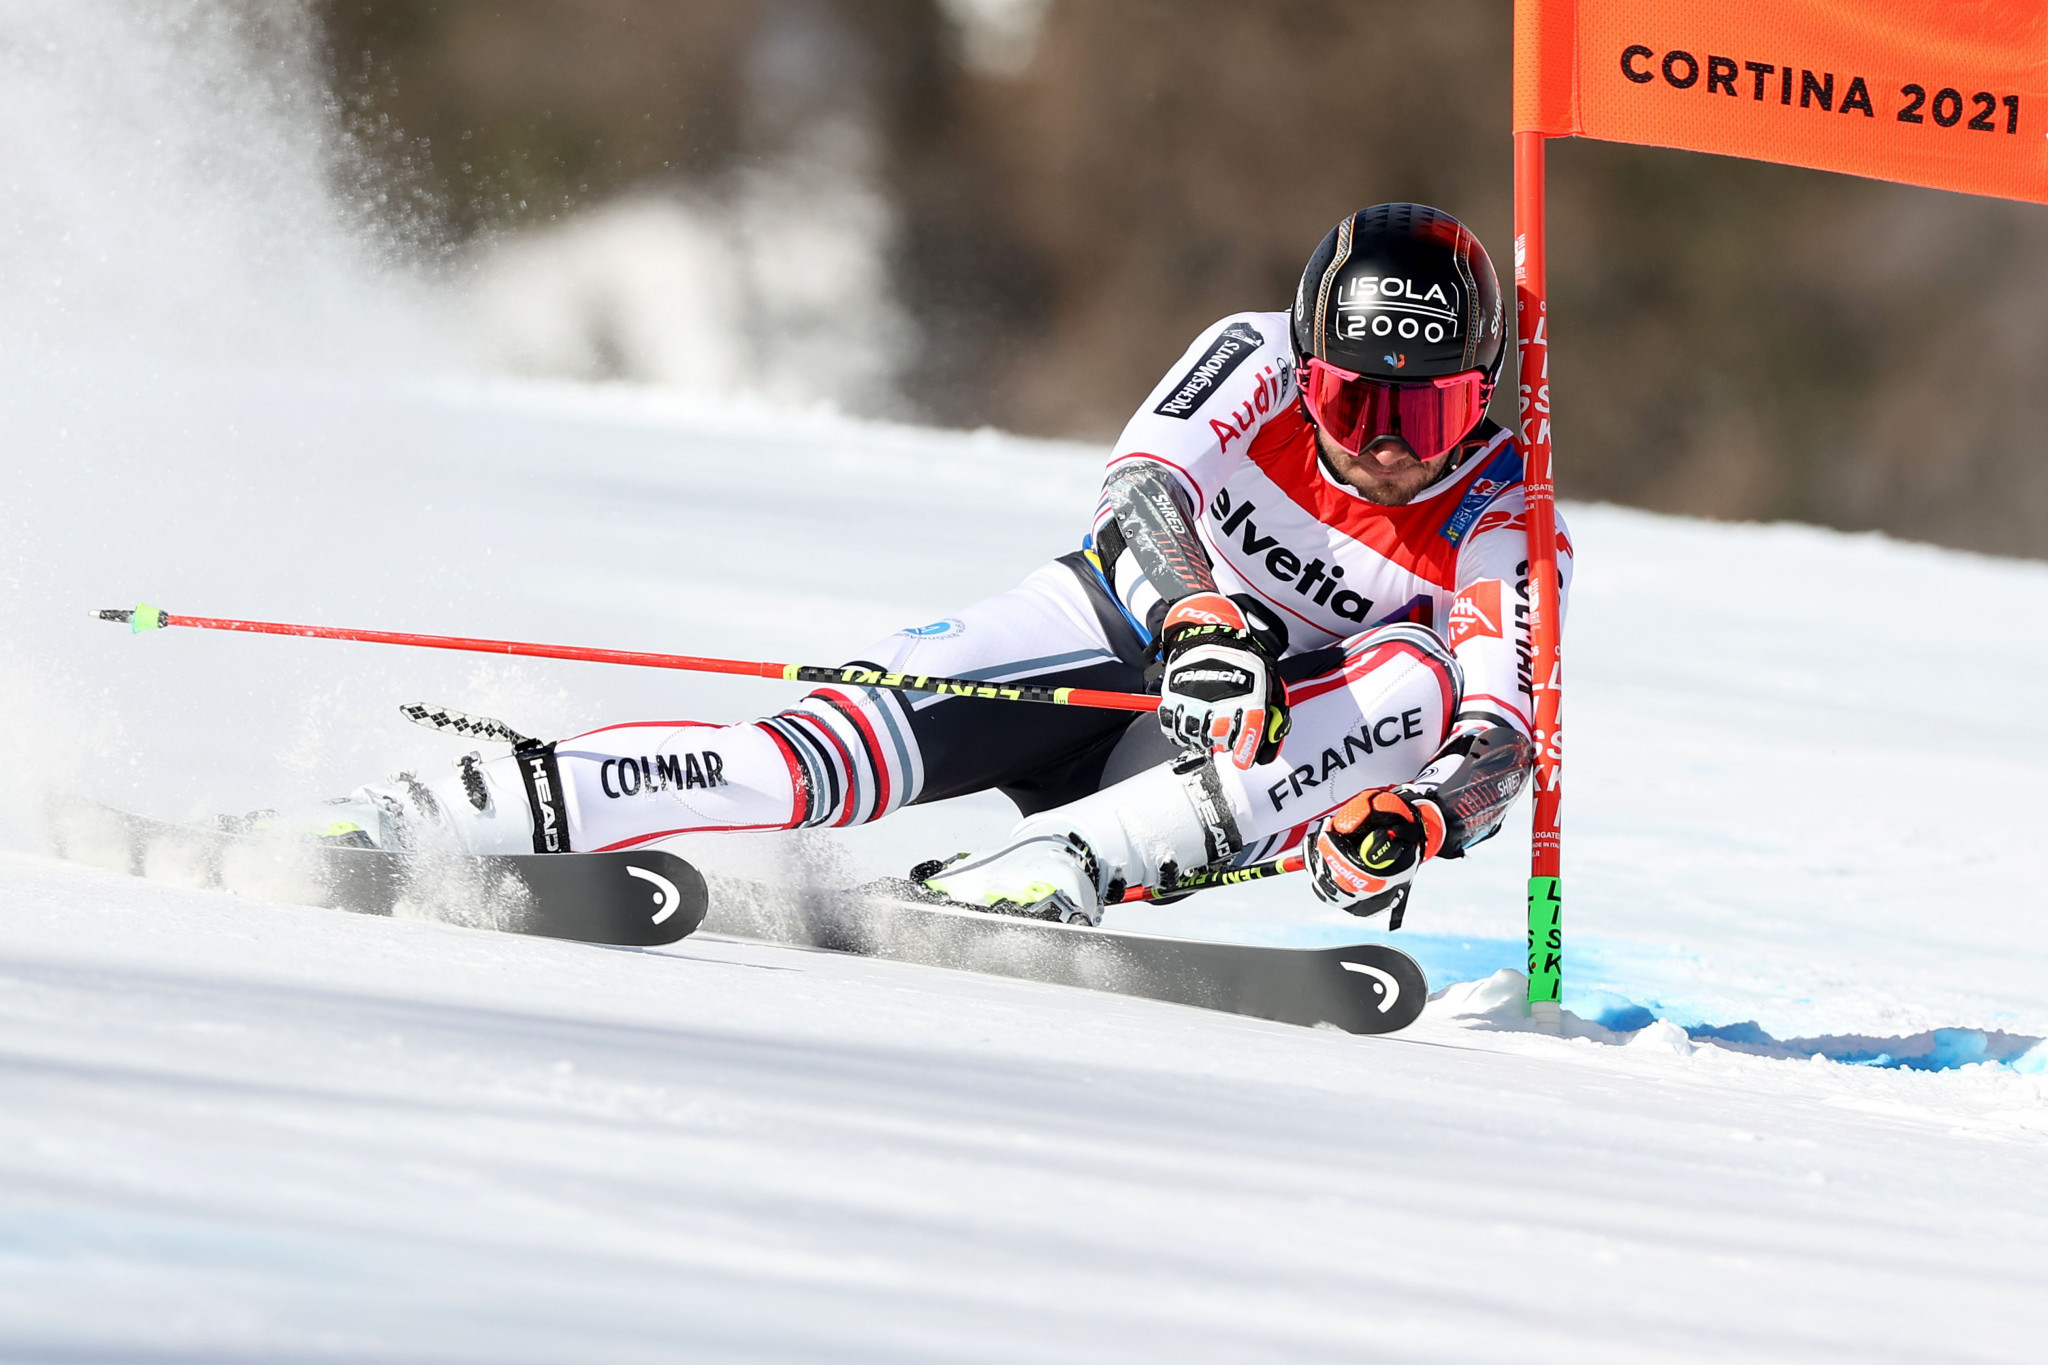 Giant slalom world champion Faivre to contest FIS Alpine Ski World Cup in Bansko